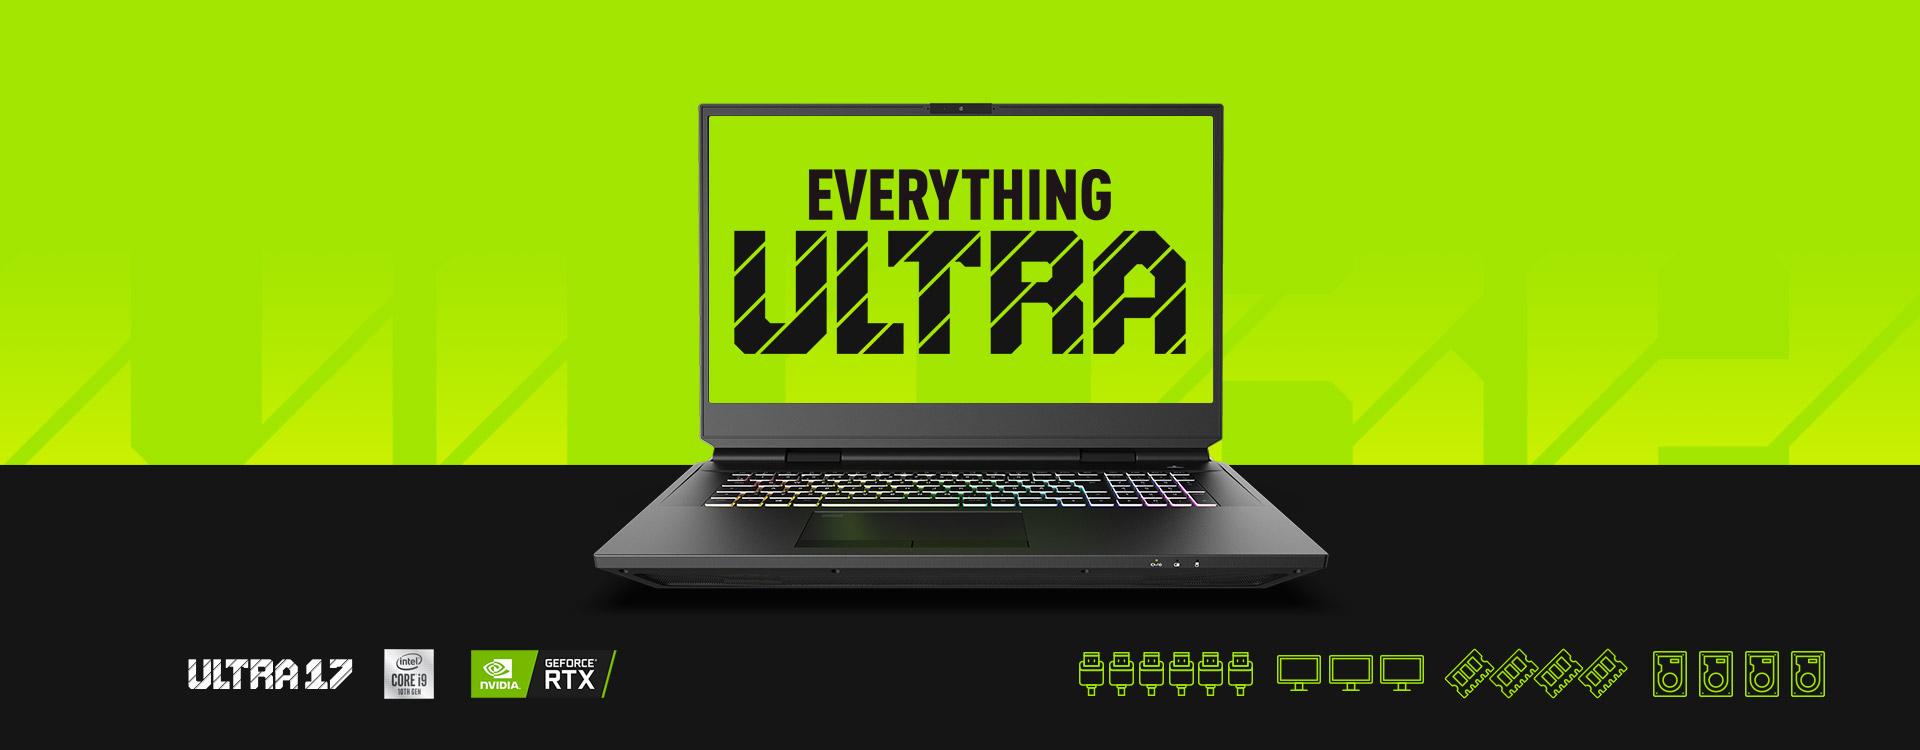 XMG ULTRA Gaming Laptop NVIDIA GeForce RTX and Intel LGA 1200